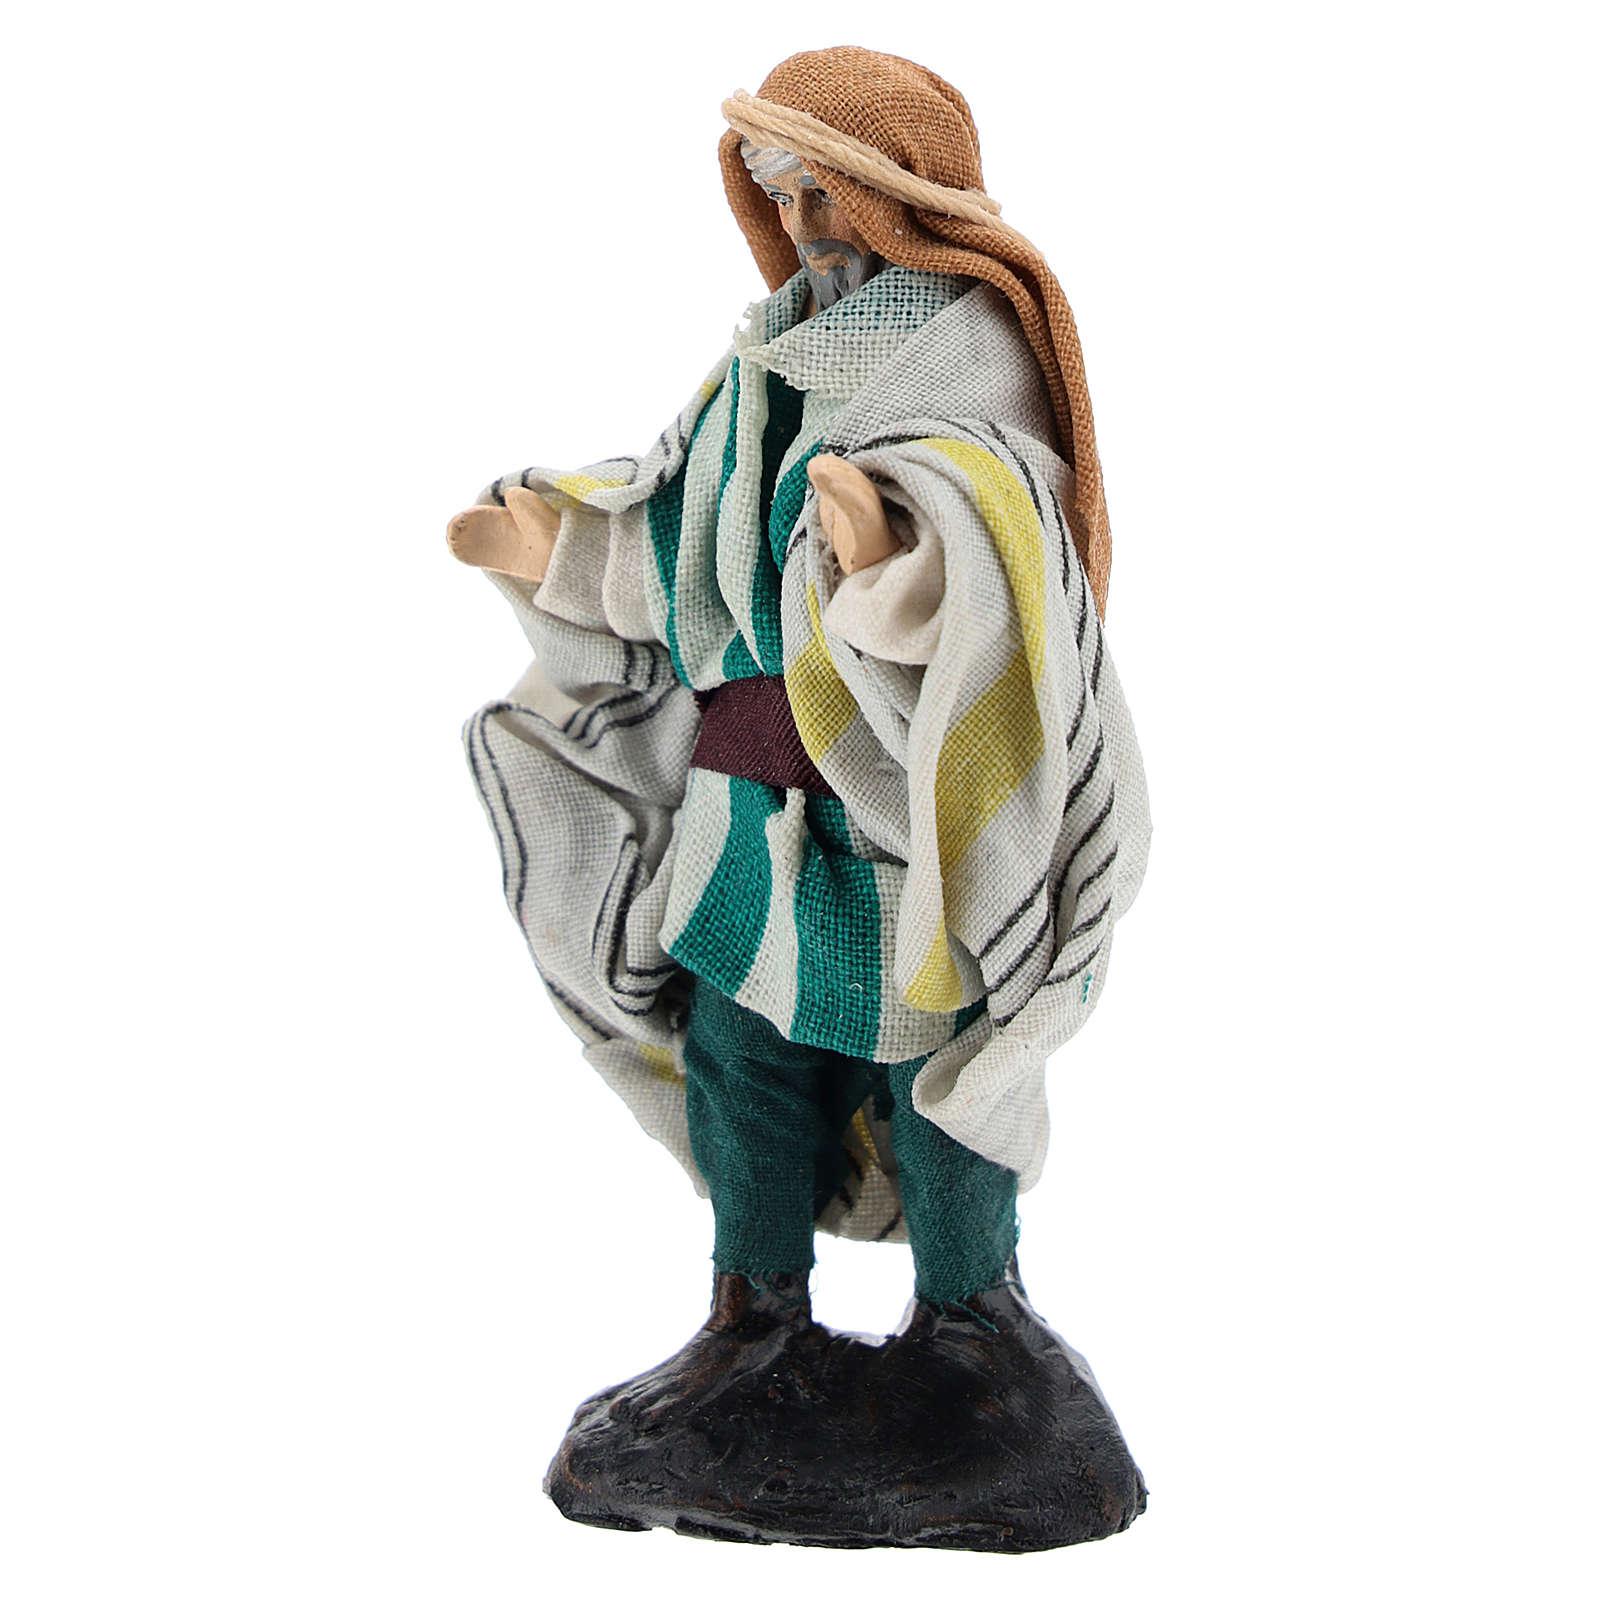 Neapolitan Nativity figurine, Arabian seller, 8 cm 4